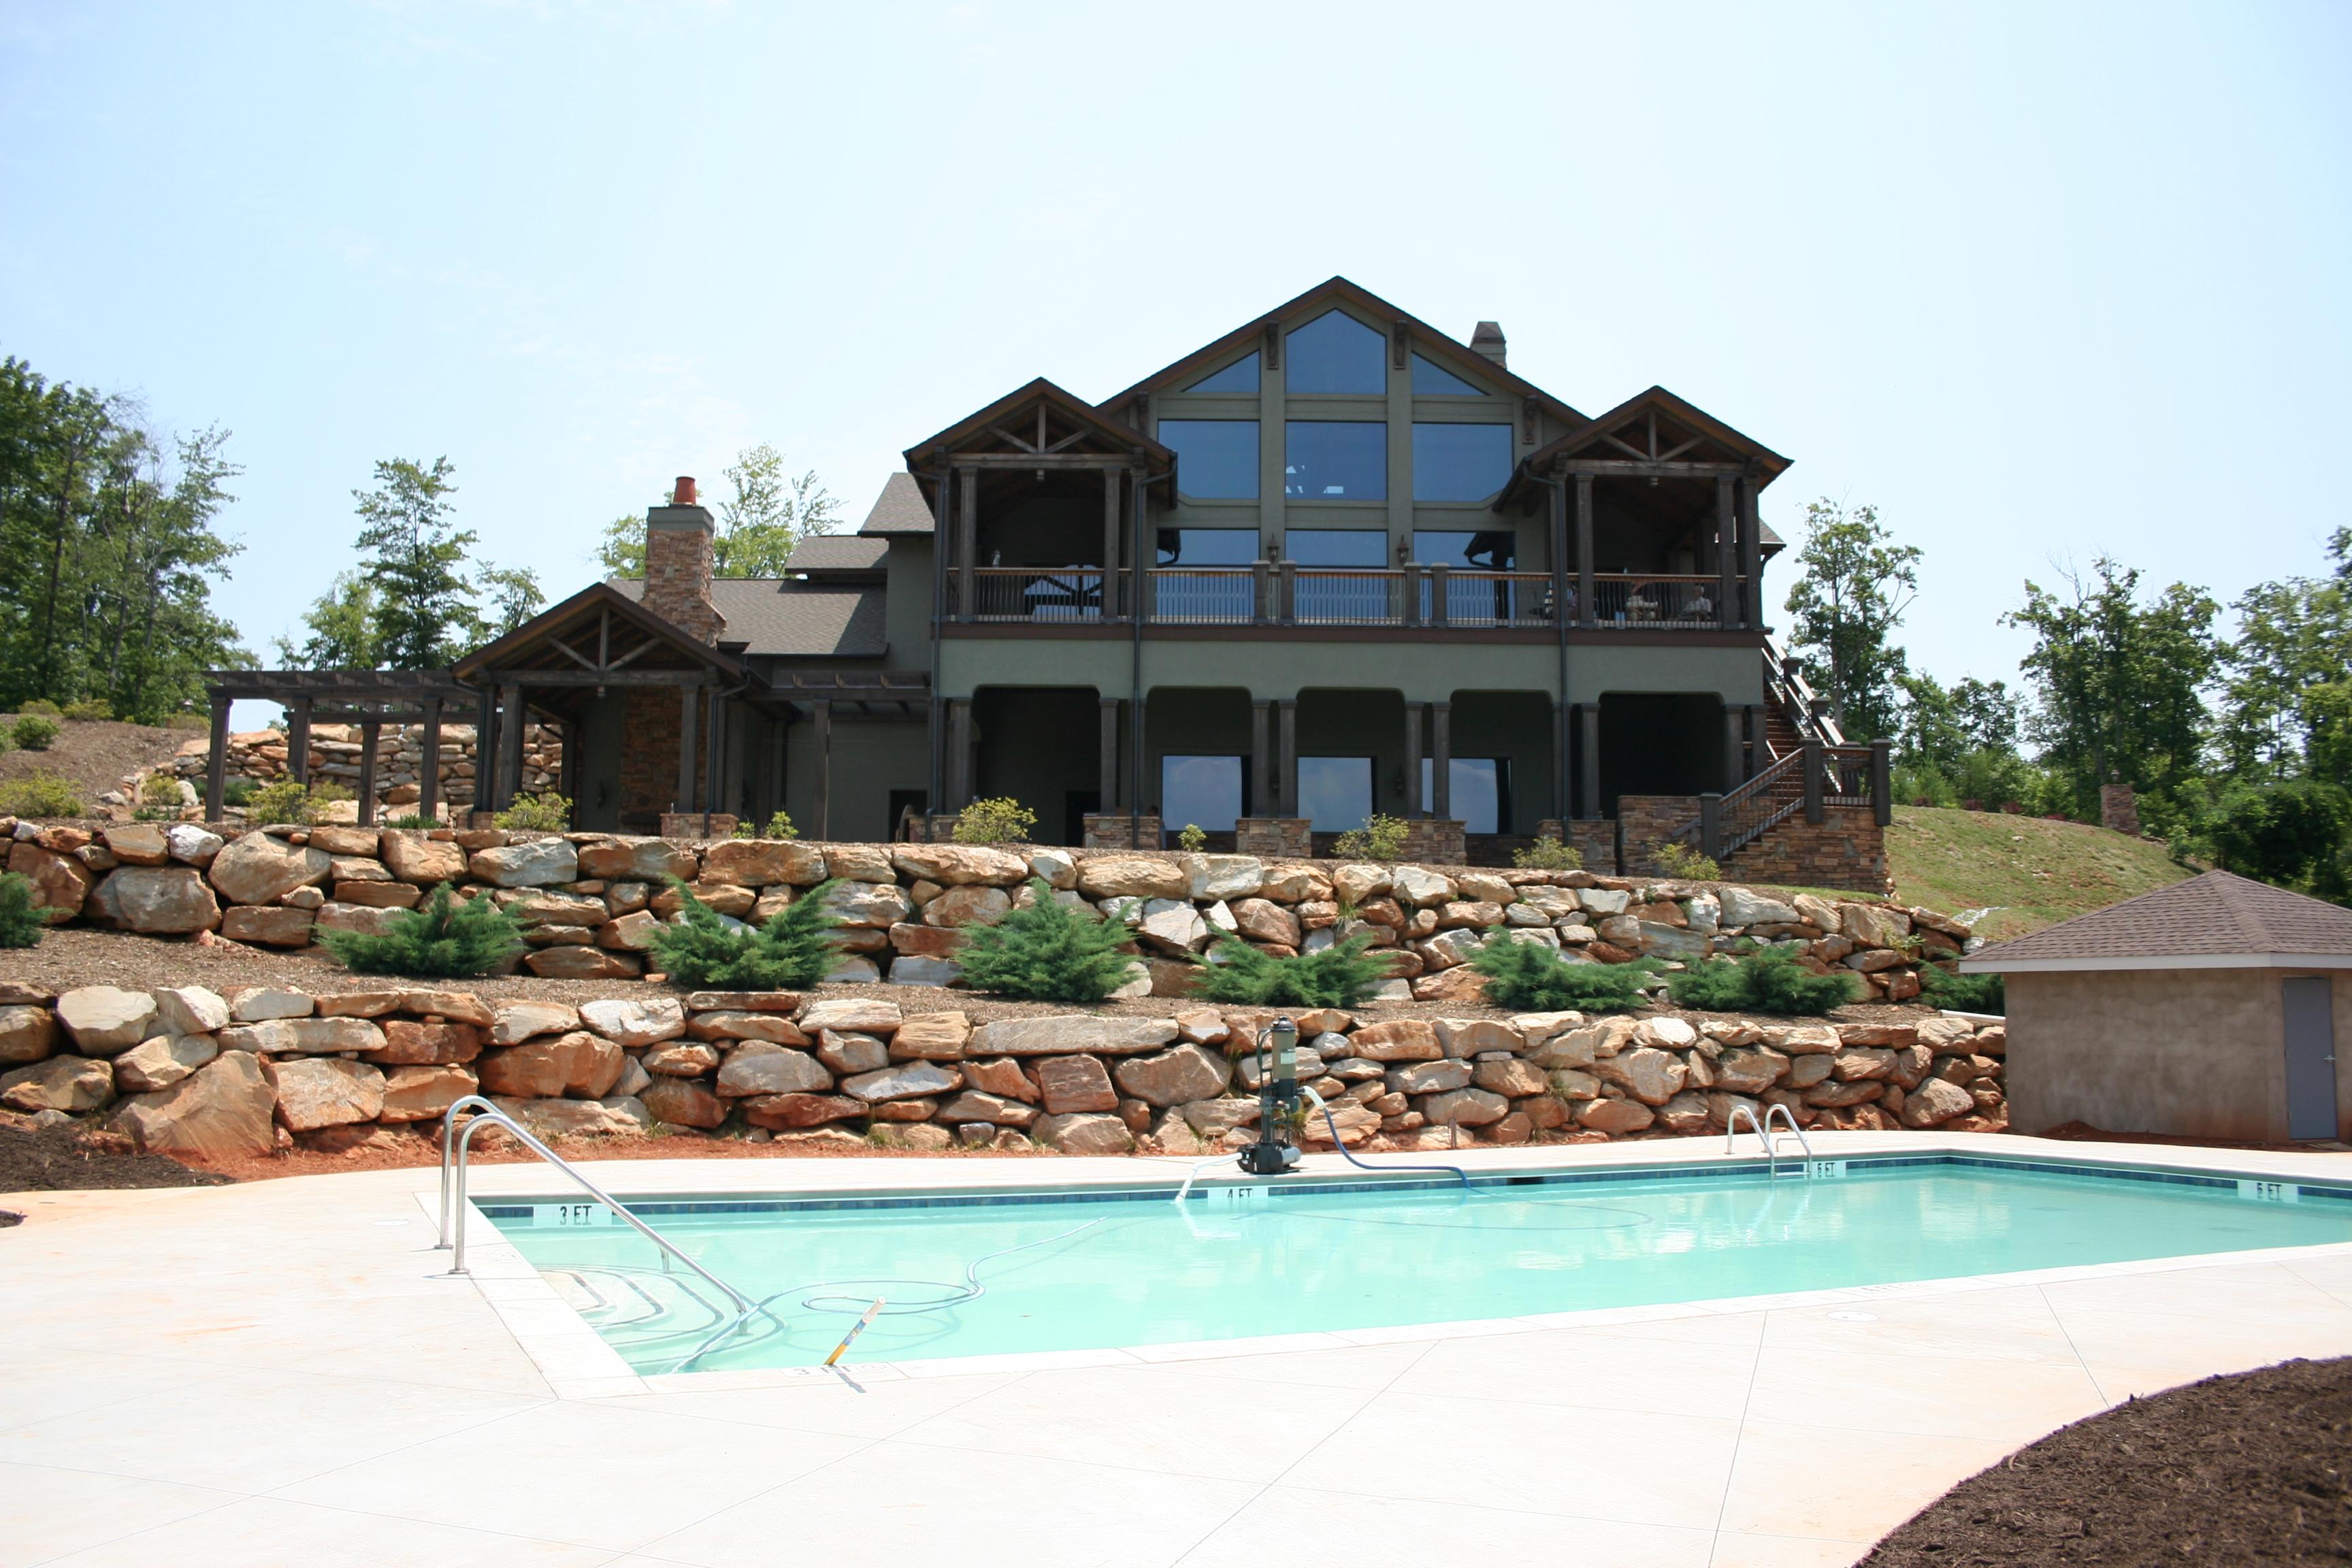 Bill's Mountain Outdoor Pool